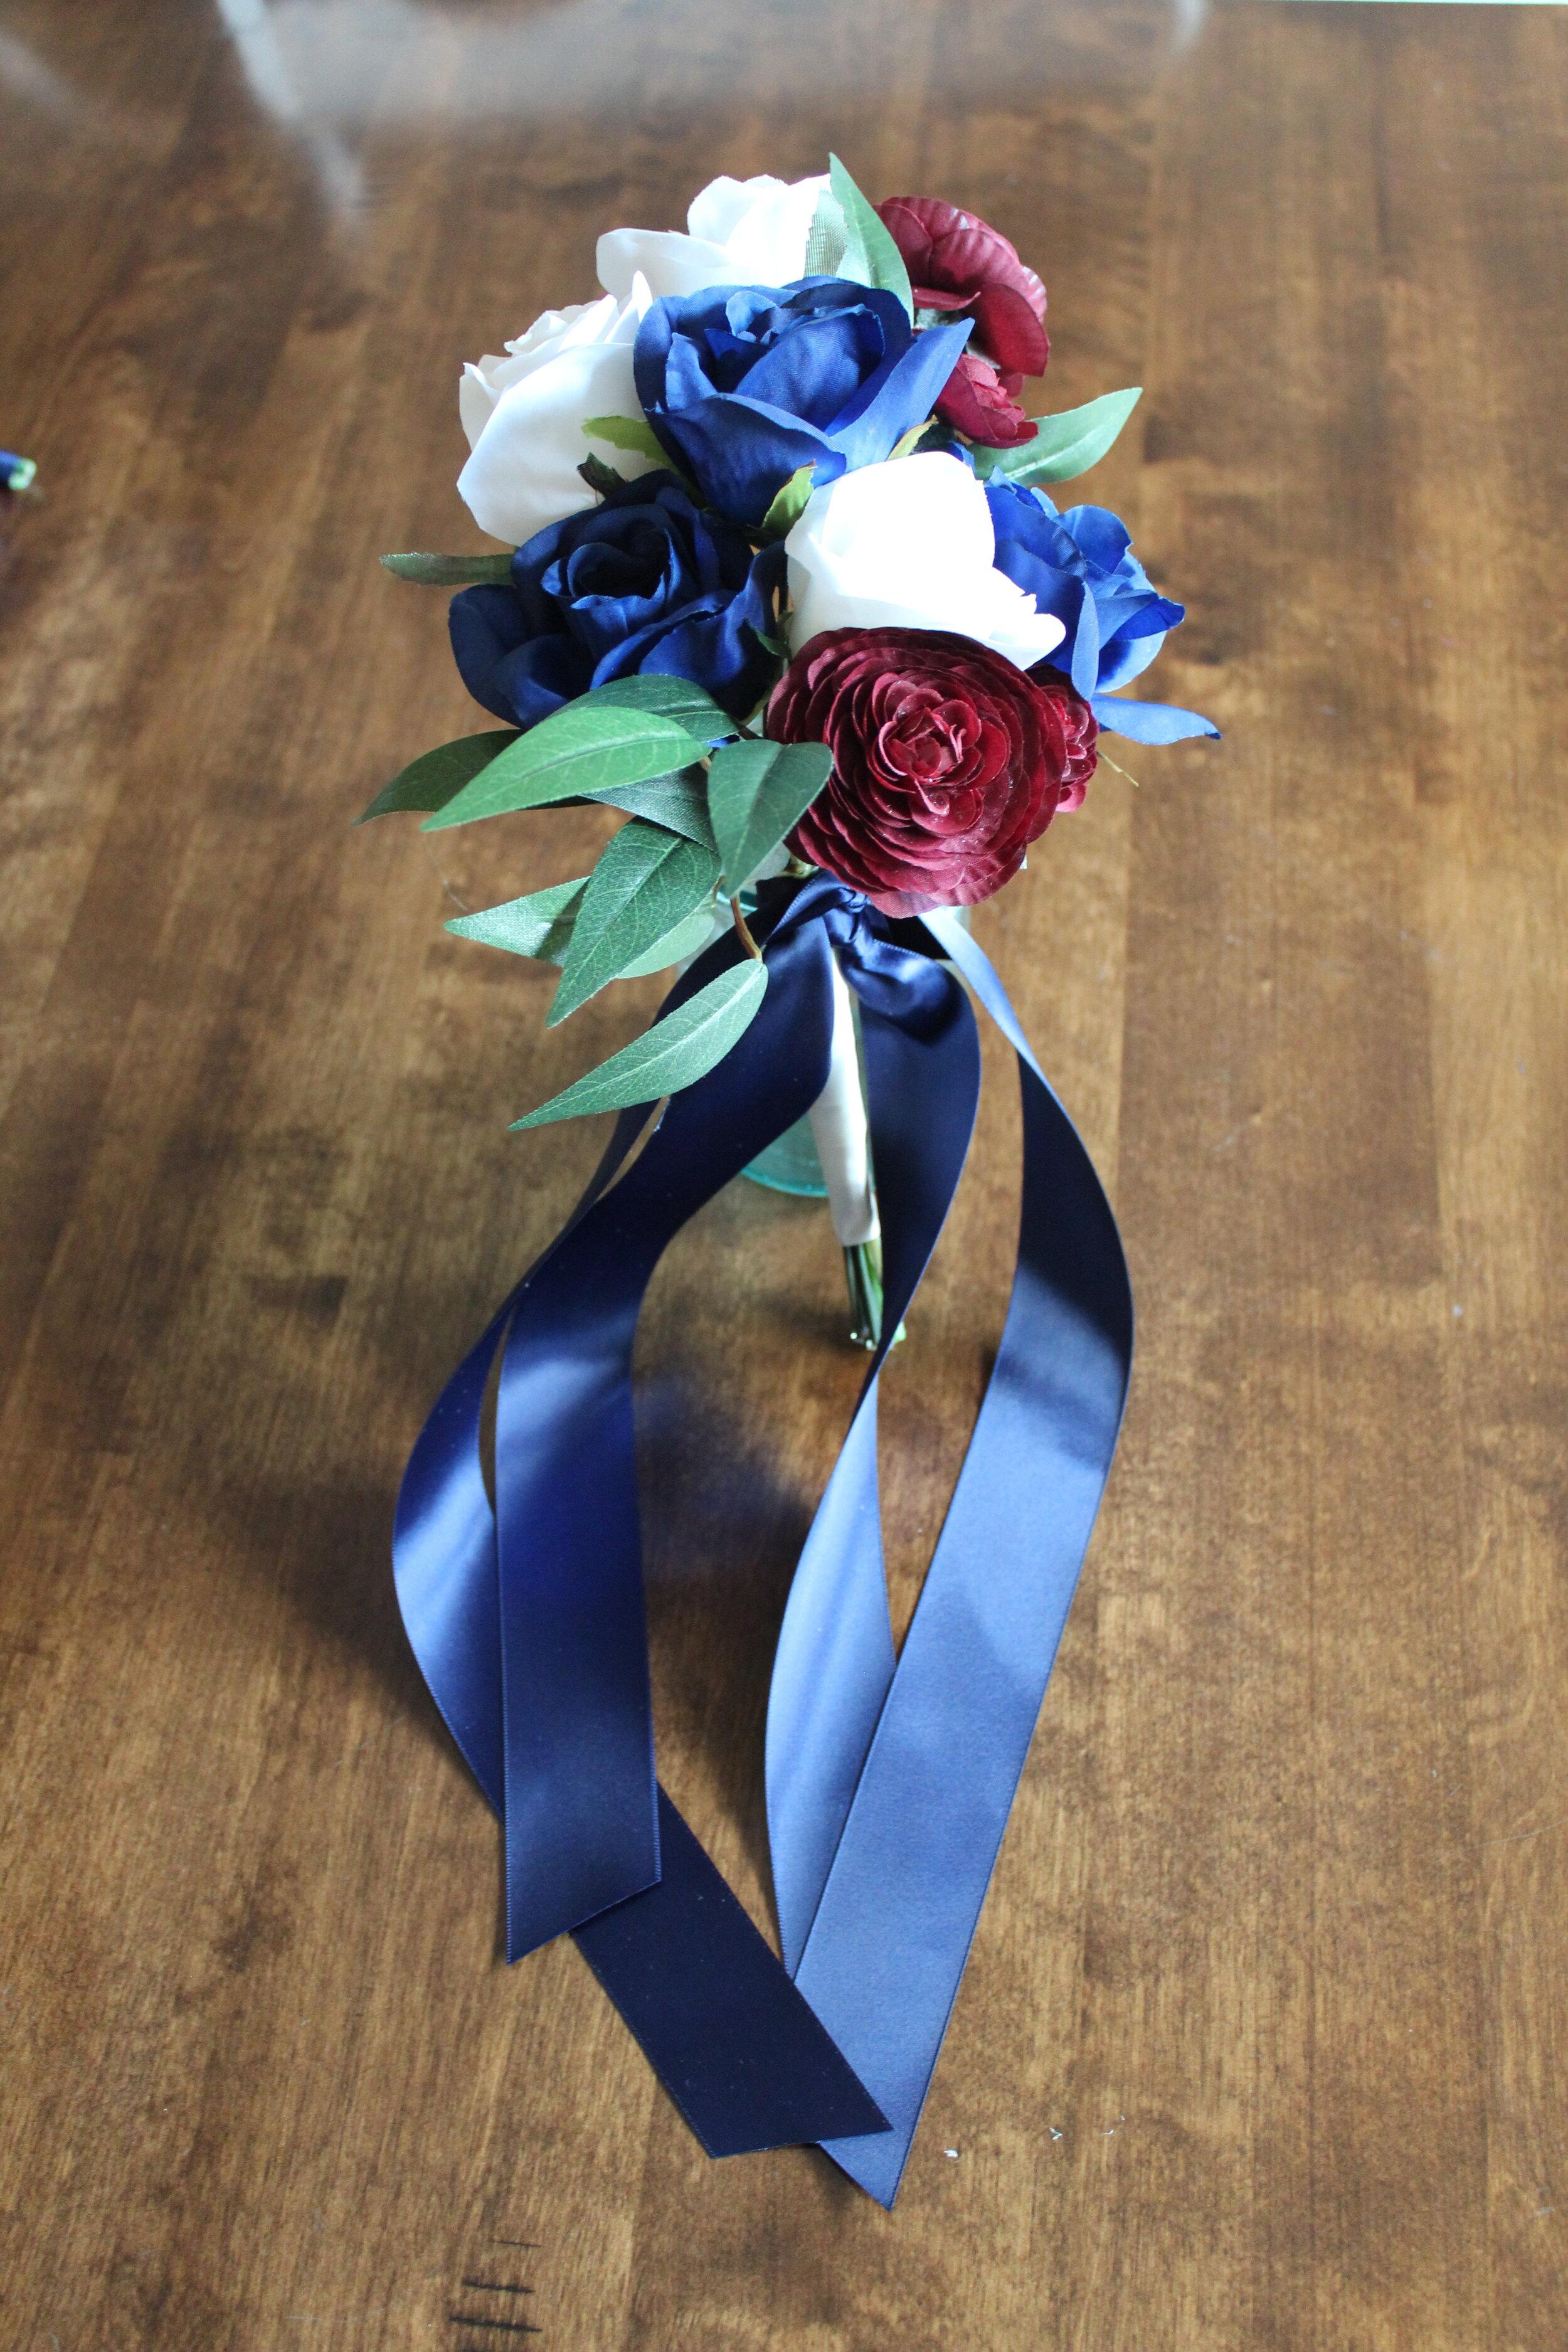 silk-bridal-bouquet-custom-wedding-flowers-boutonnieres.jpg